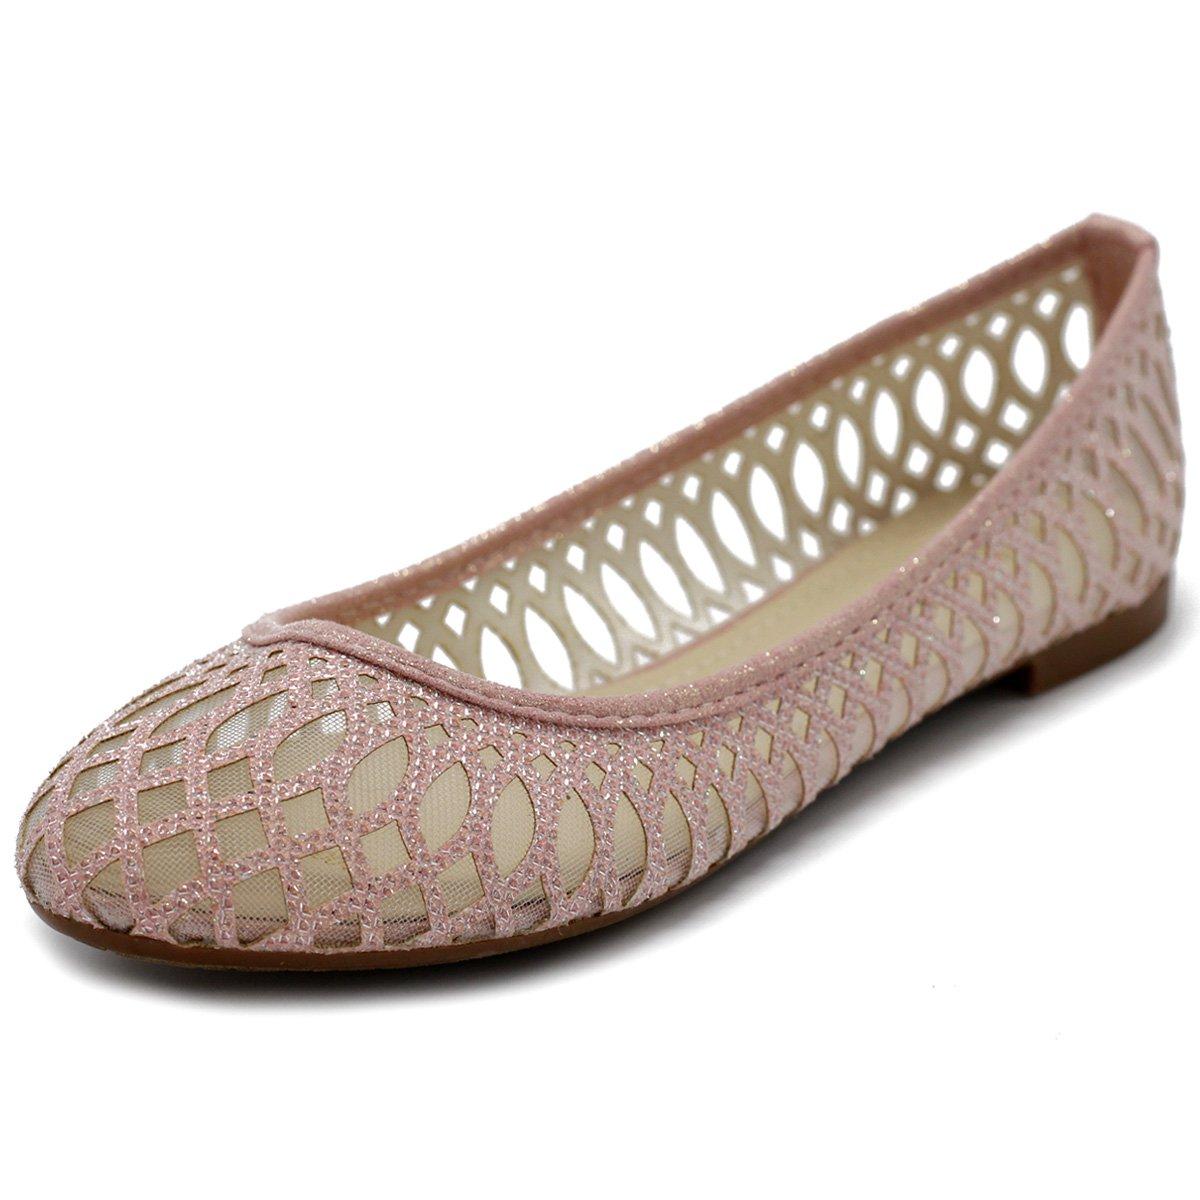 Ollio Women's Shoe Breathable Mesh Glitter Comfort Slip-on Ballet Flat 2 Styles BN11(9 B(M) US, Style1-Pink)